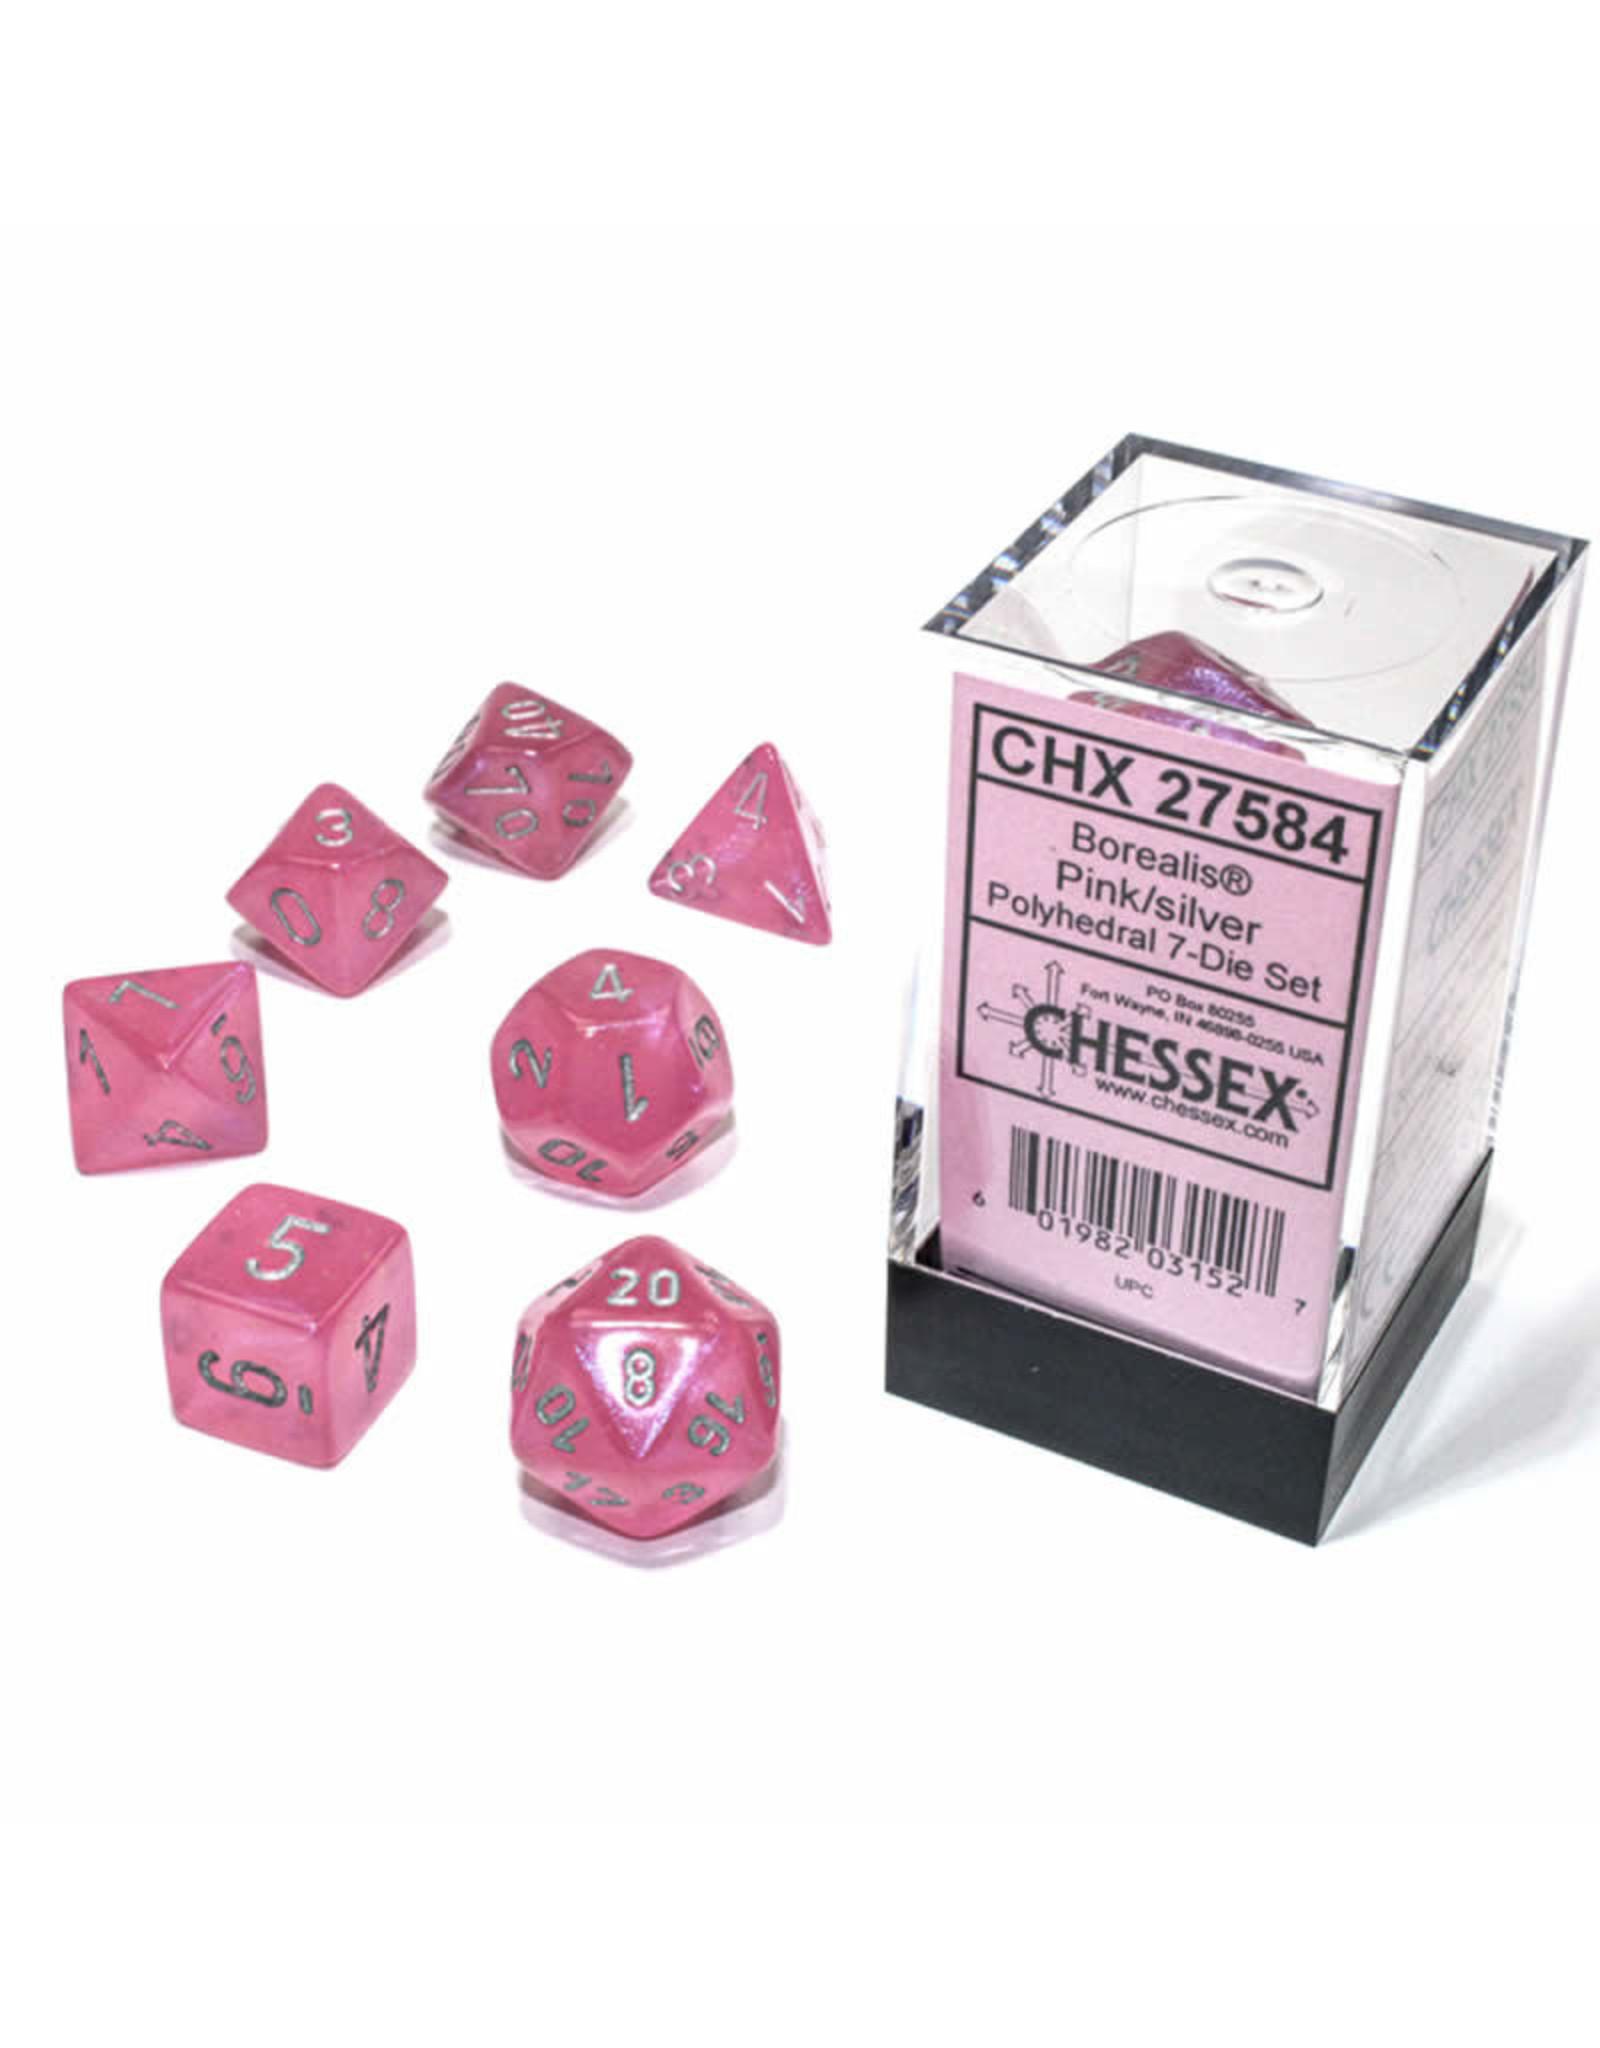 Chessex Polyhedral Dice Set: Borealis Pink Set (7)